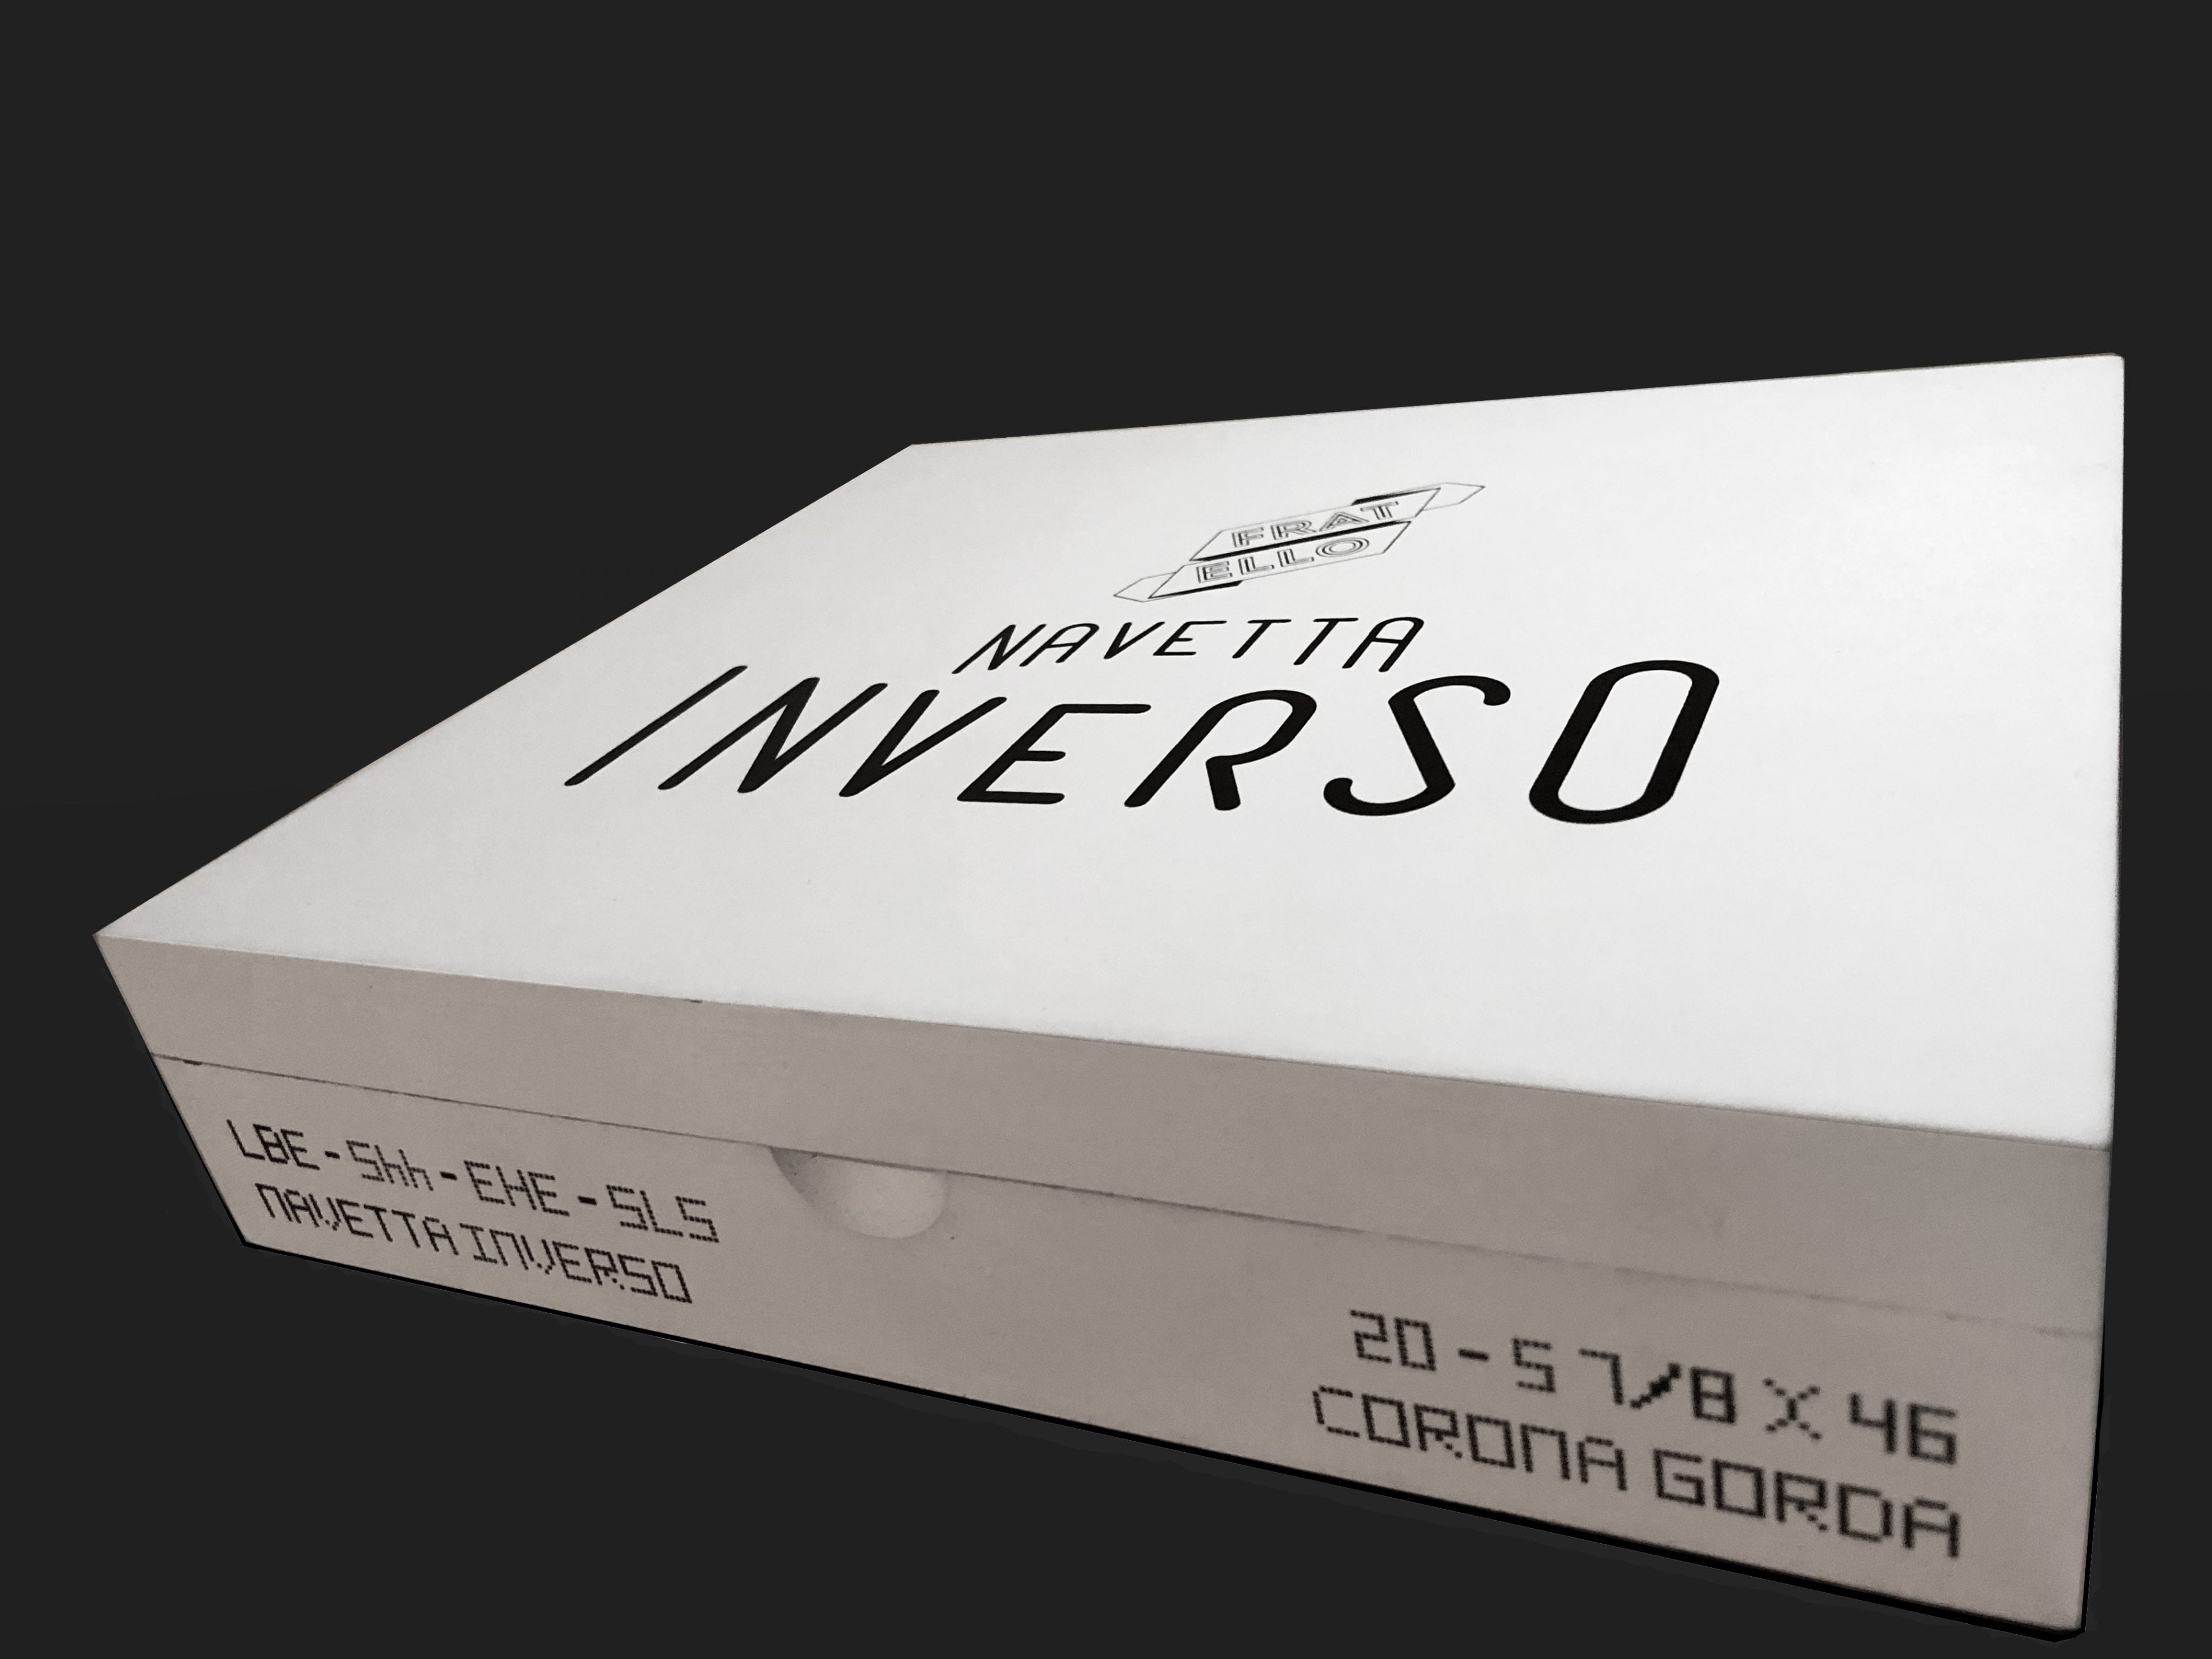 Cigar News: Fratello Introduces Navetta Inverso